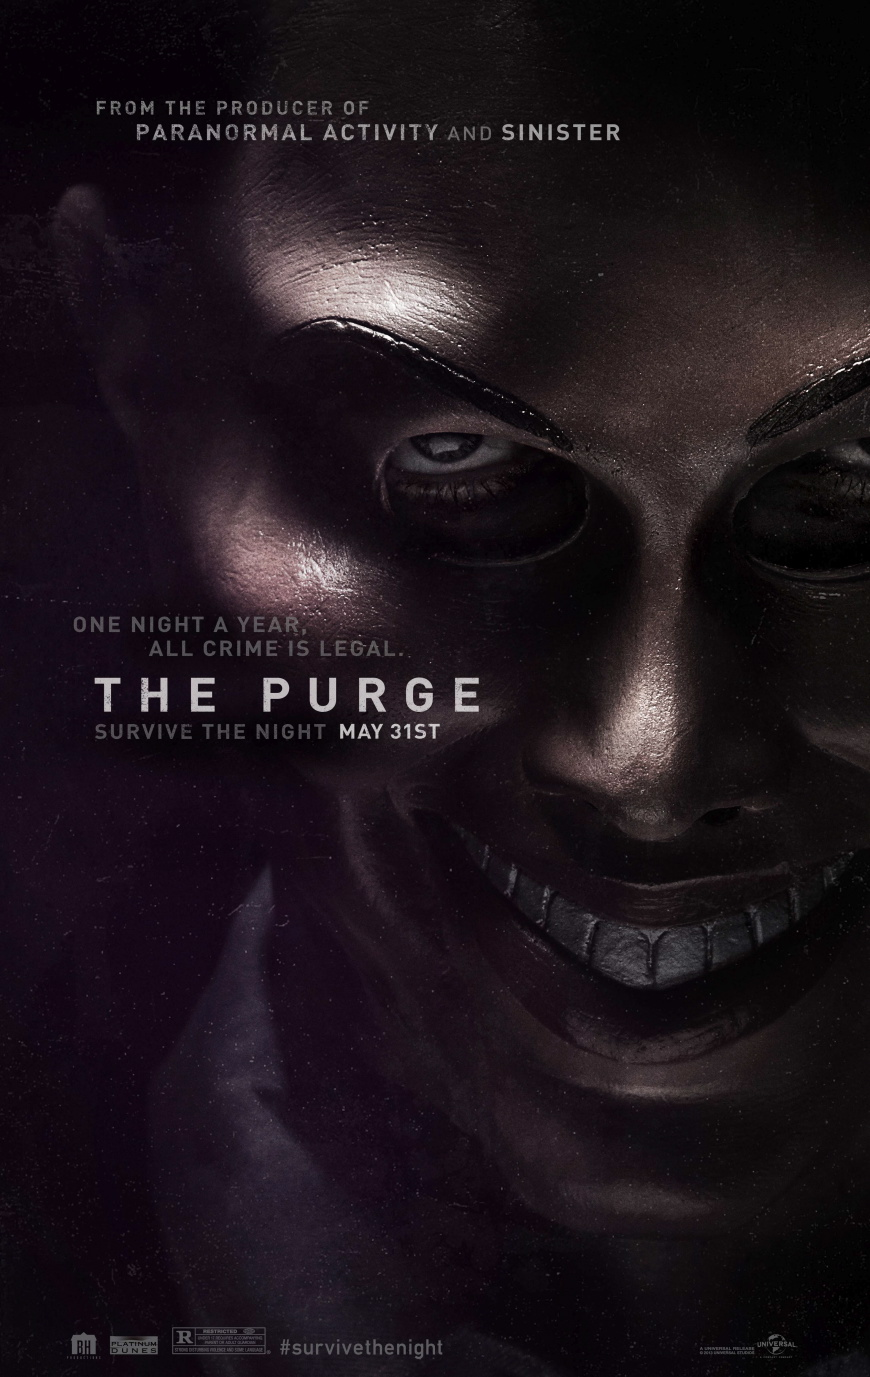 The-Purge-2013-Movie-Poster.jpg